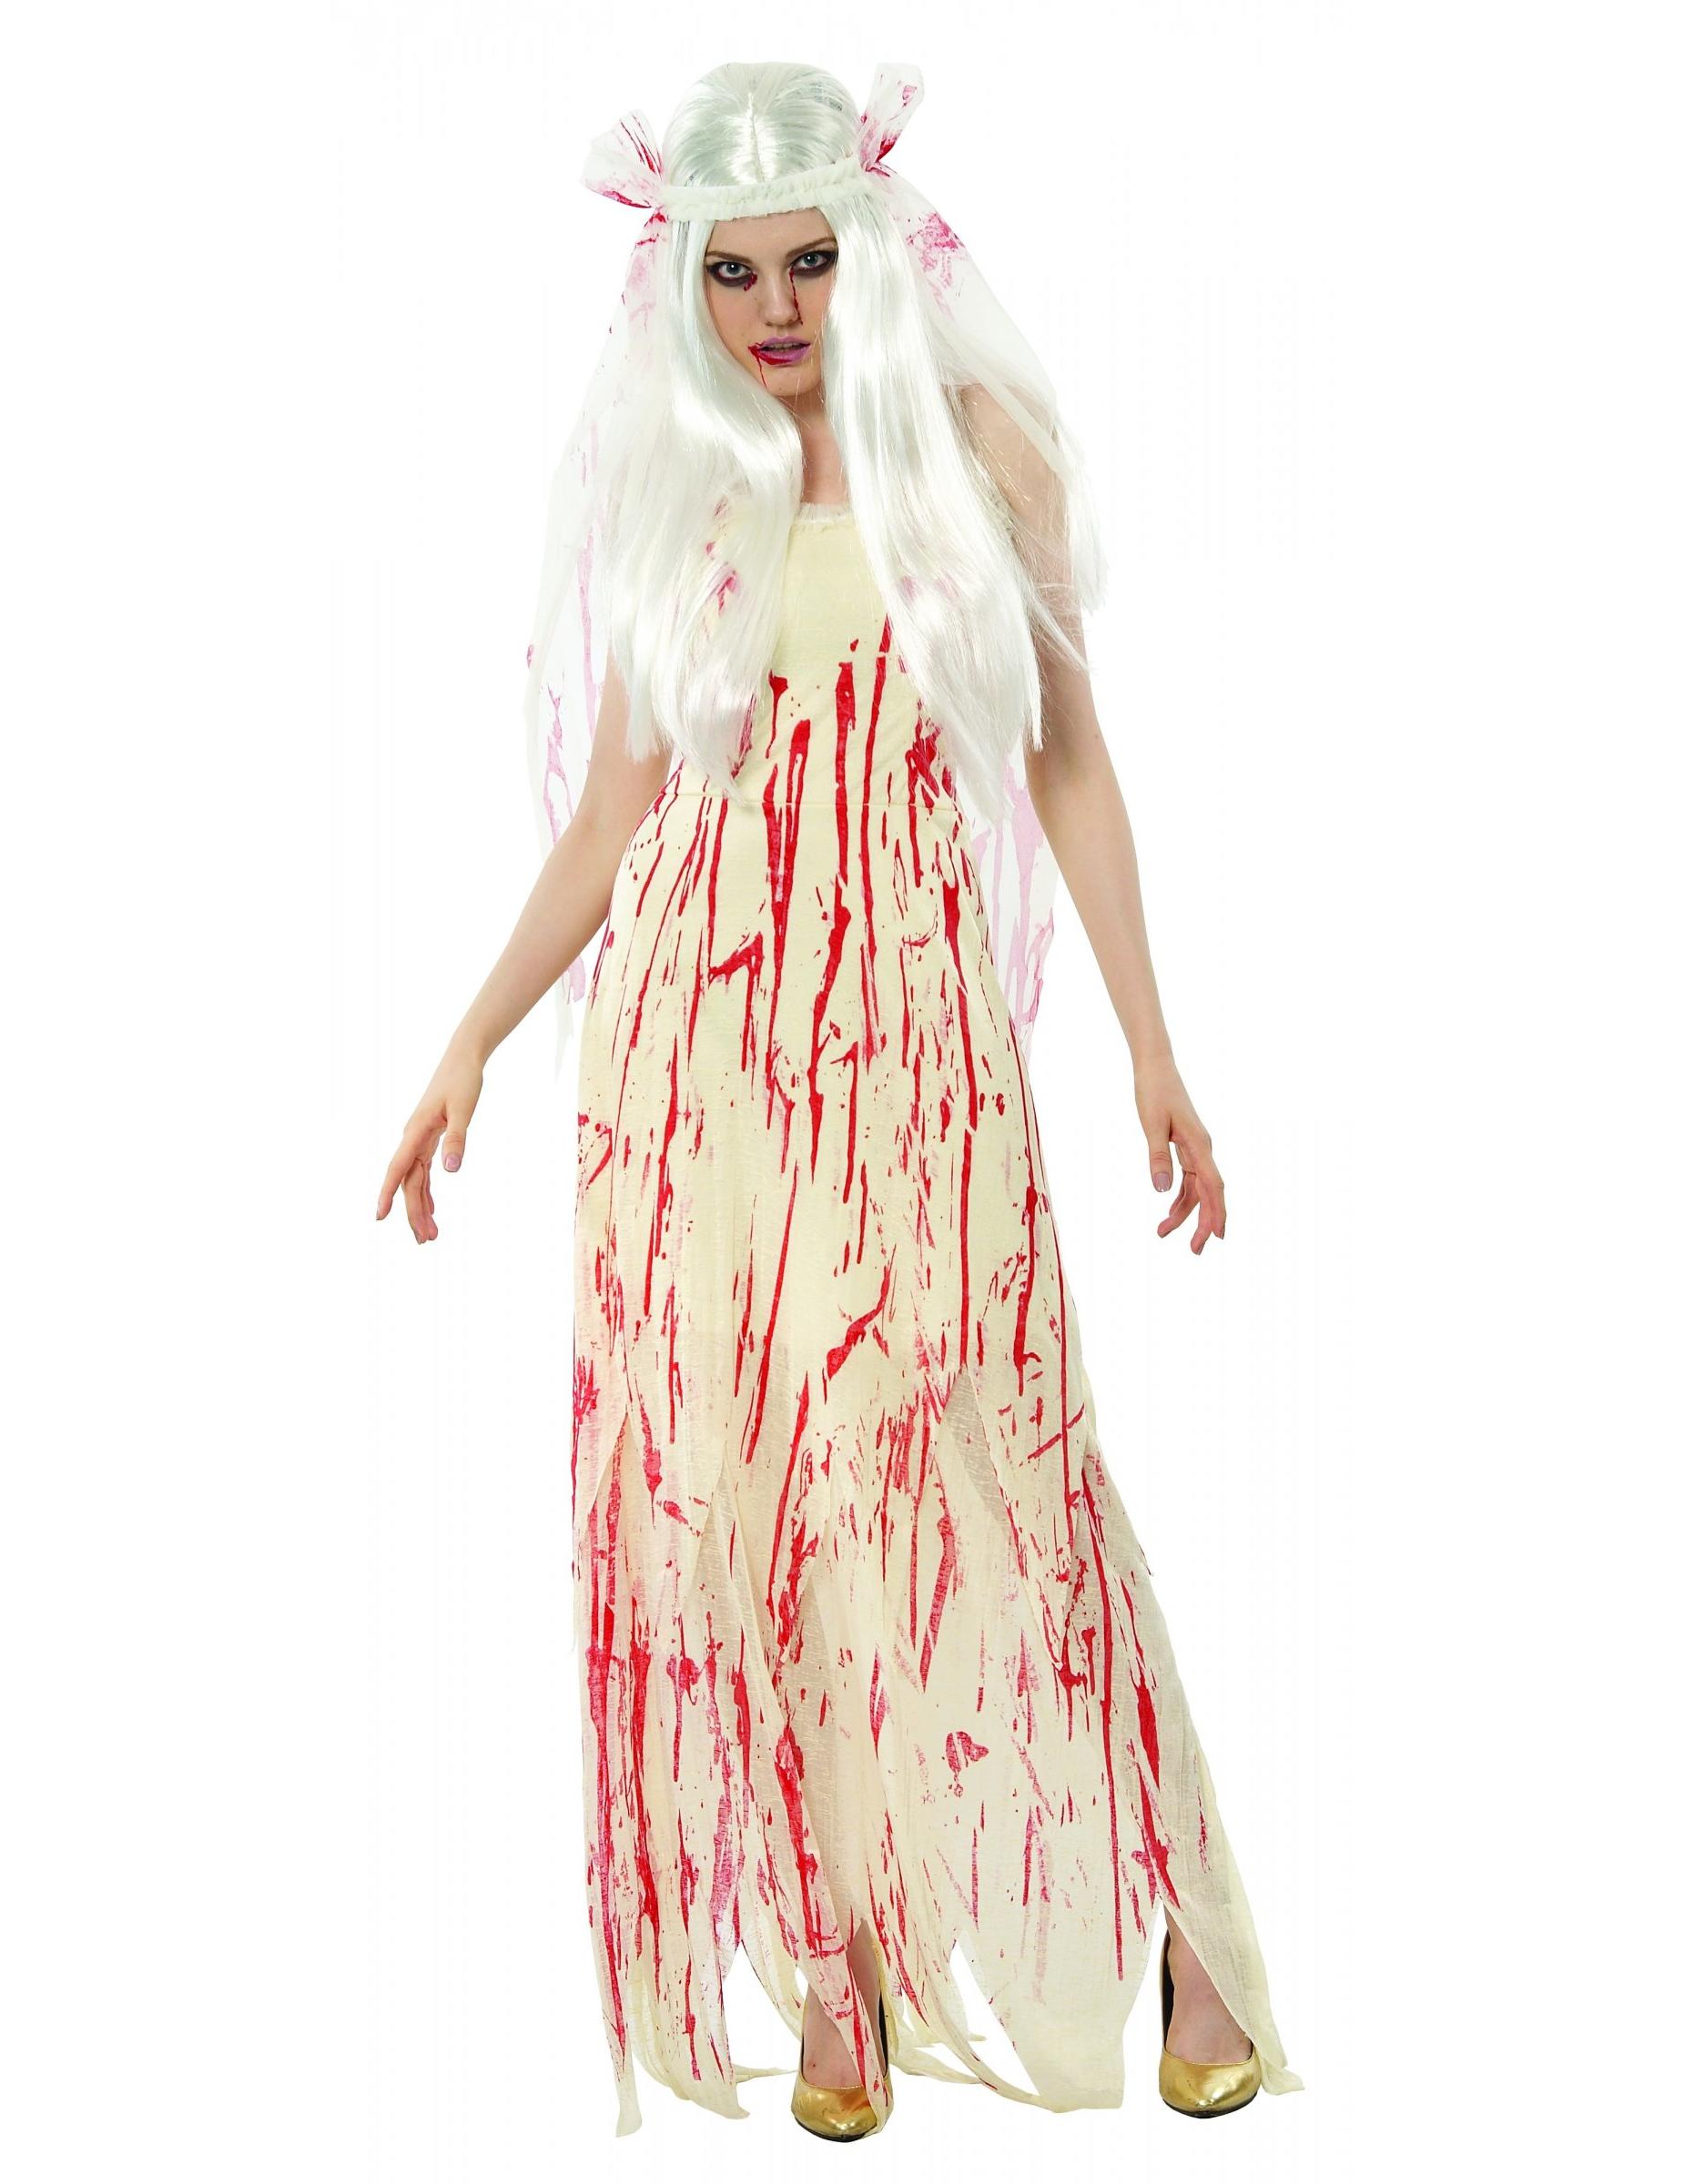 bloody bride costume halloween. Black Bedroom Furniture Sets. Home Design Ideas